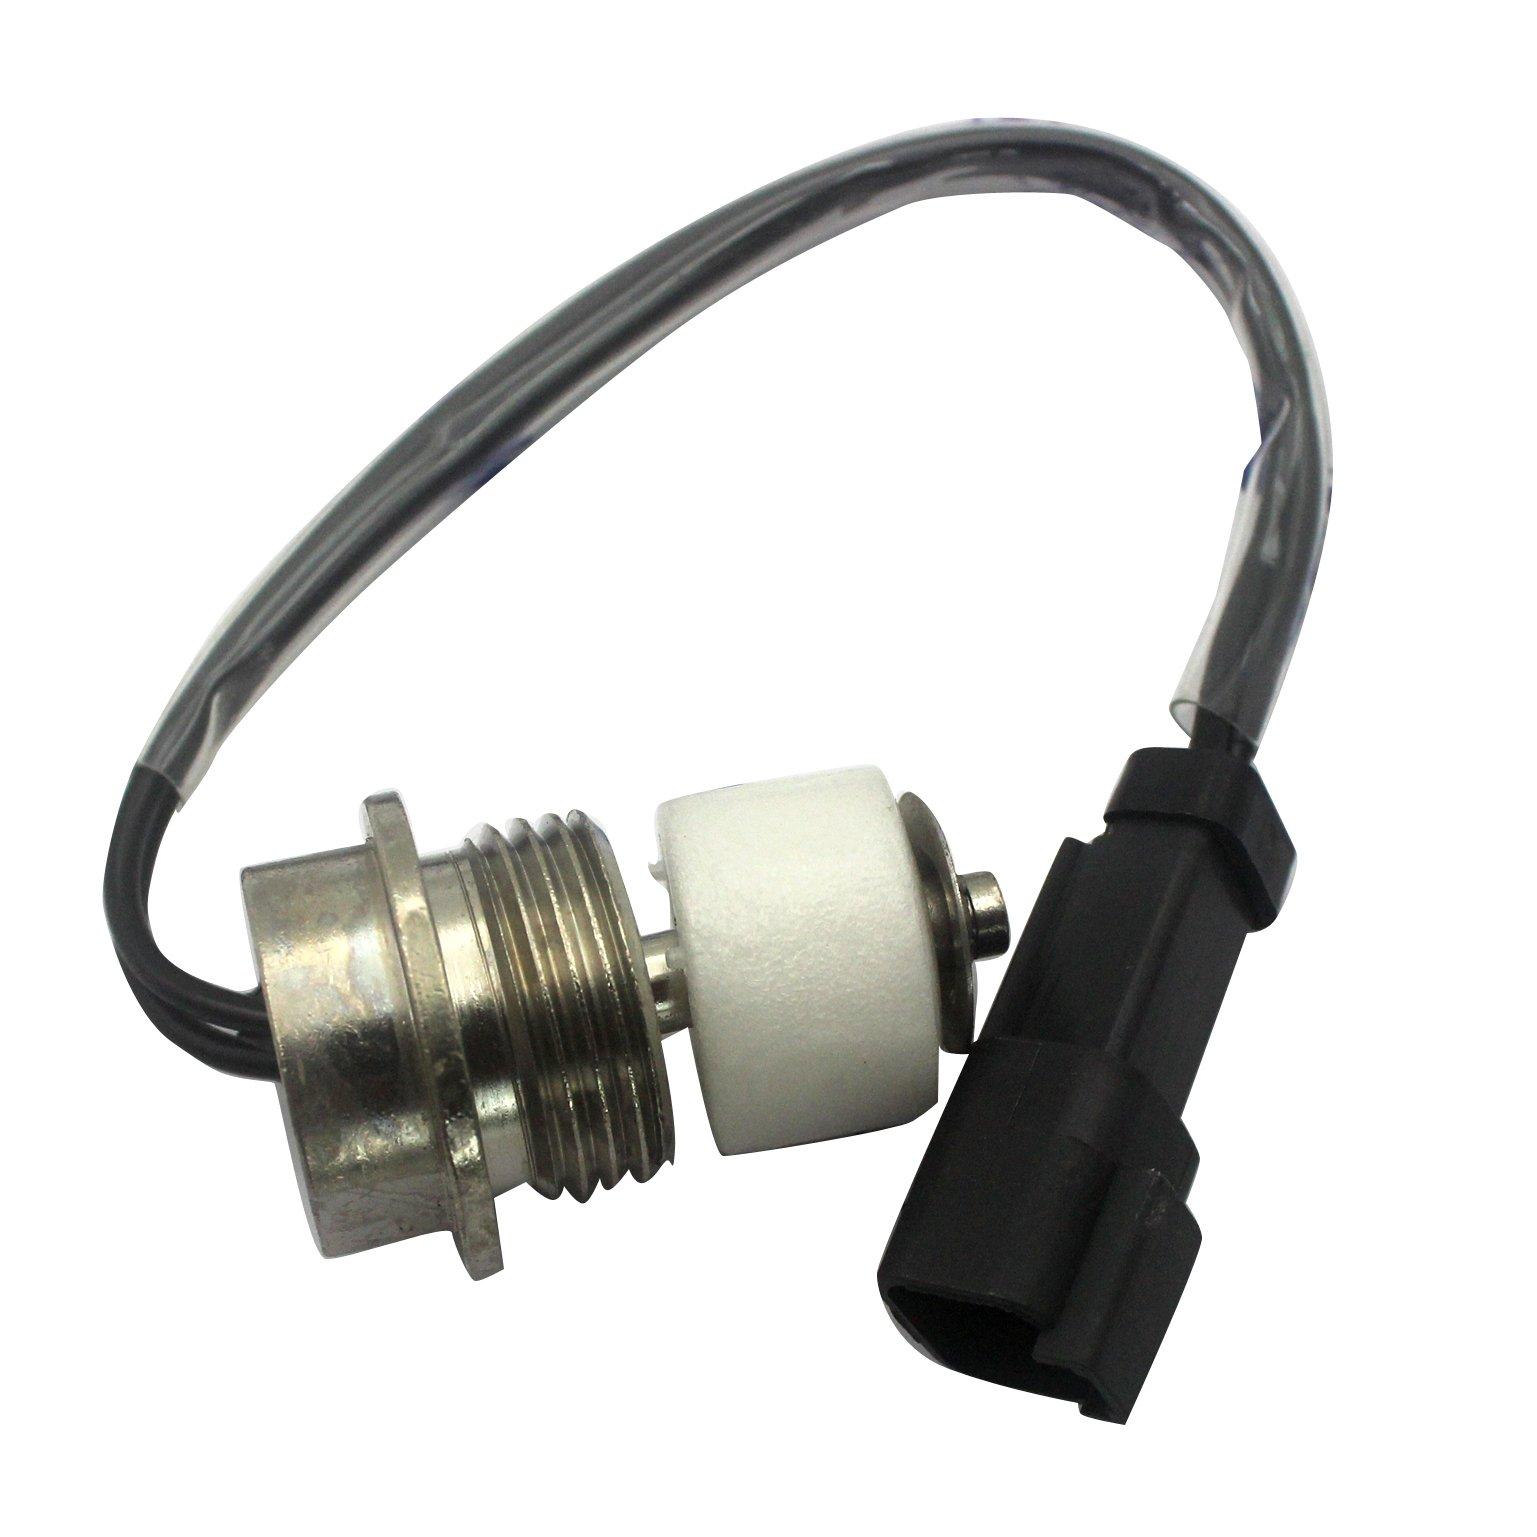 SINOCMP 216-8684 2168684 Excavator Oil Pressure Sensor for Caterpillar E320B E320C Engine Hydraulic Oil Level Sensor, 3 Month Warranty